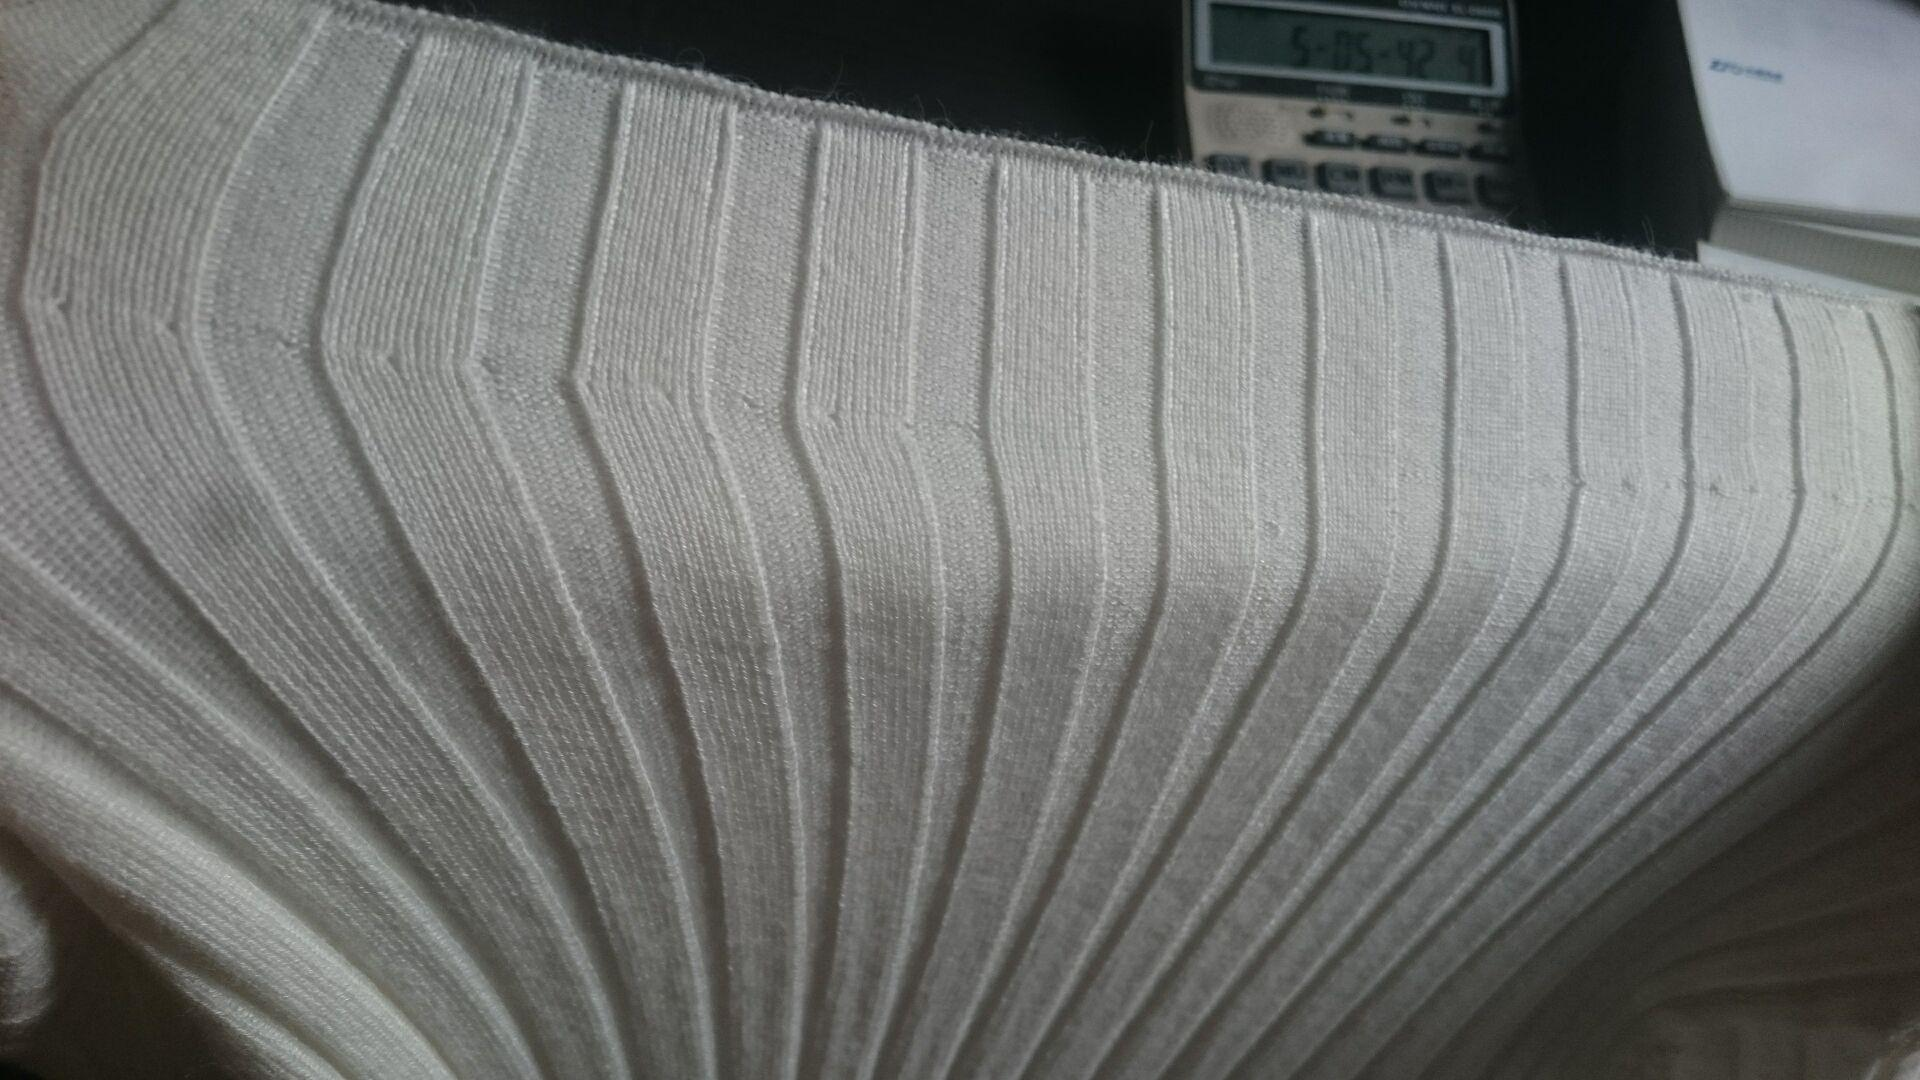 Iceinside Корейских Женщин Водолазка Пуловер Свитер Женские Свитера И Пуловеры Женский Вязаный Verticle Полосатый Свитер Топ